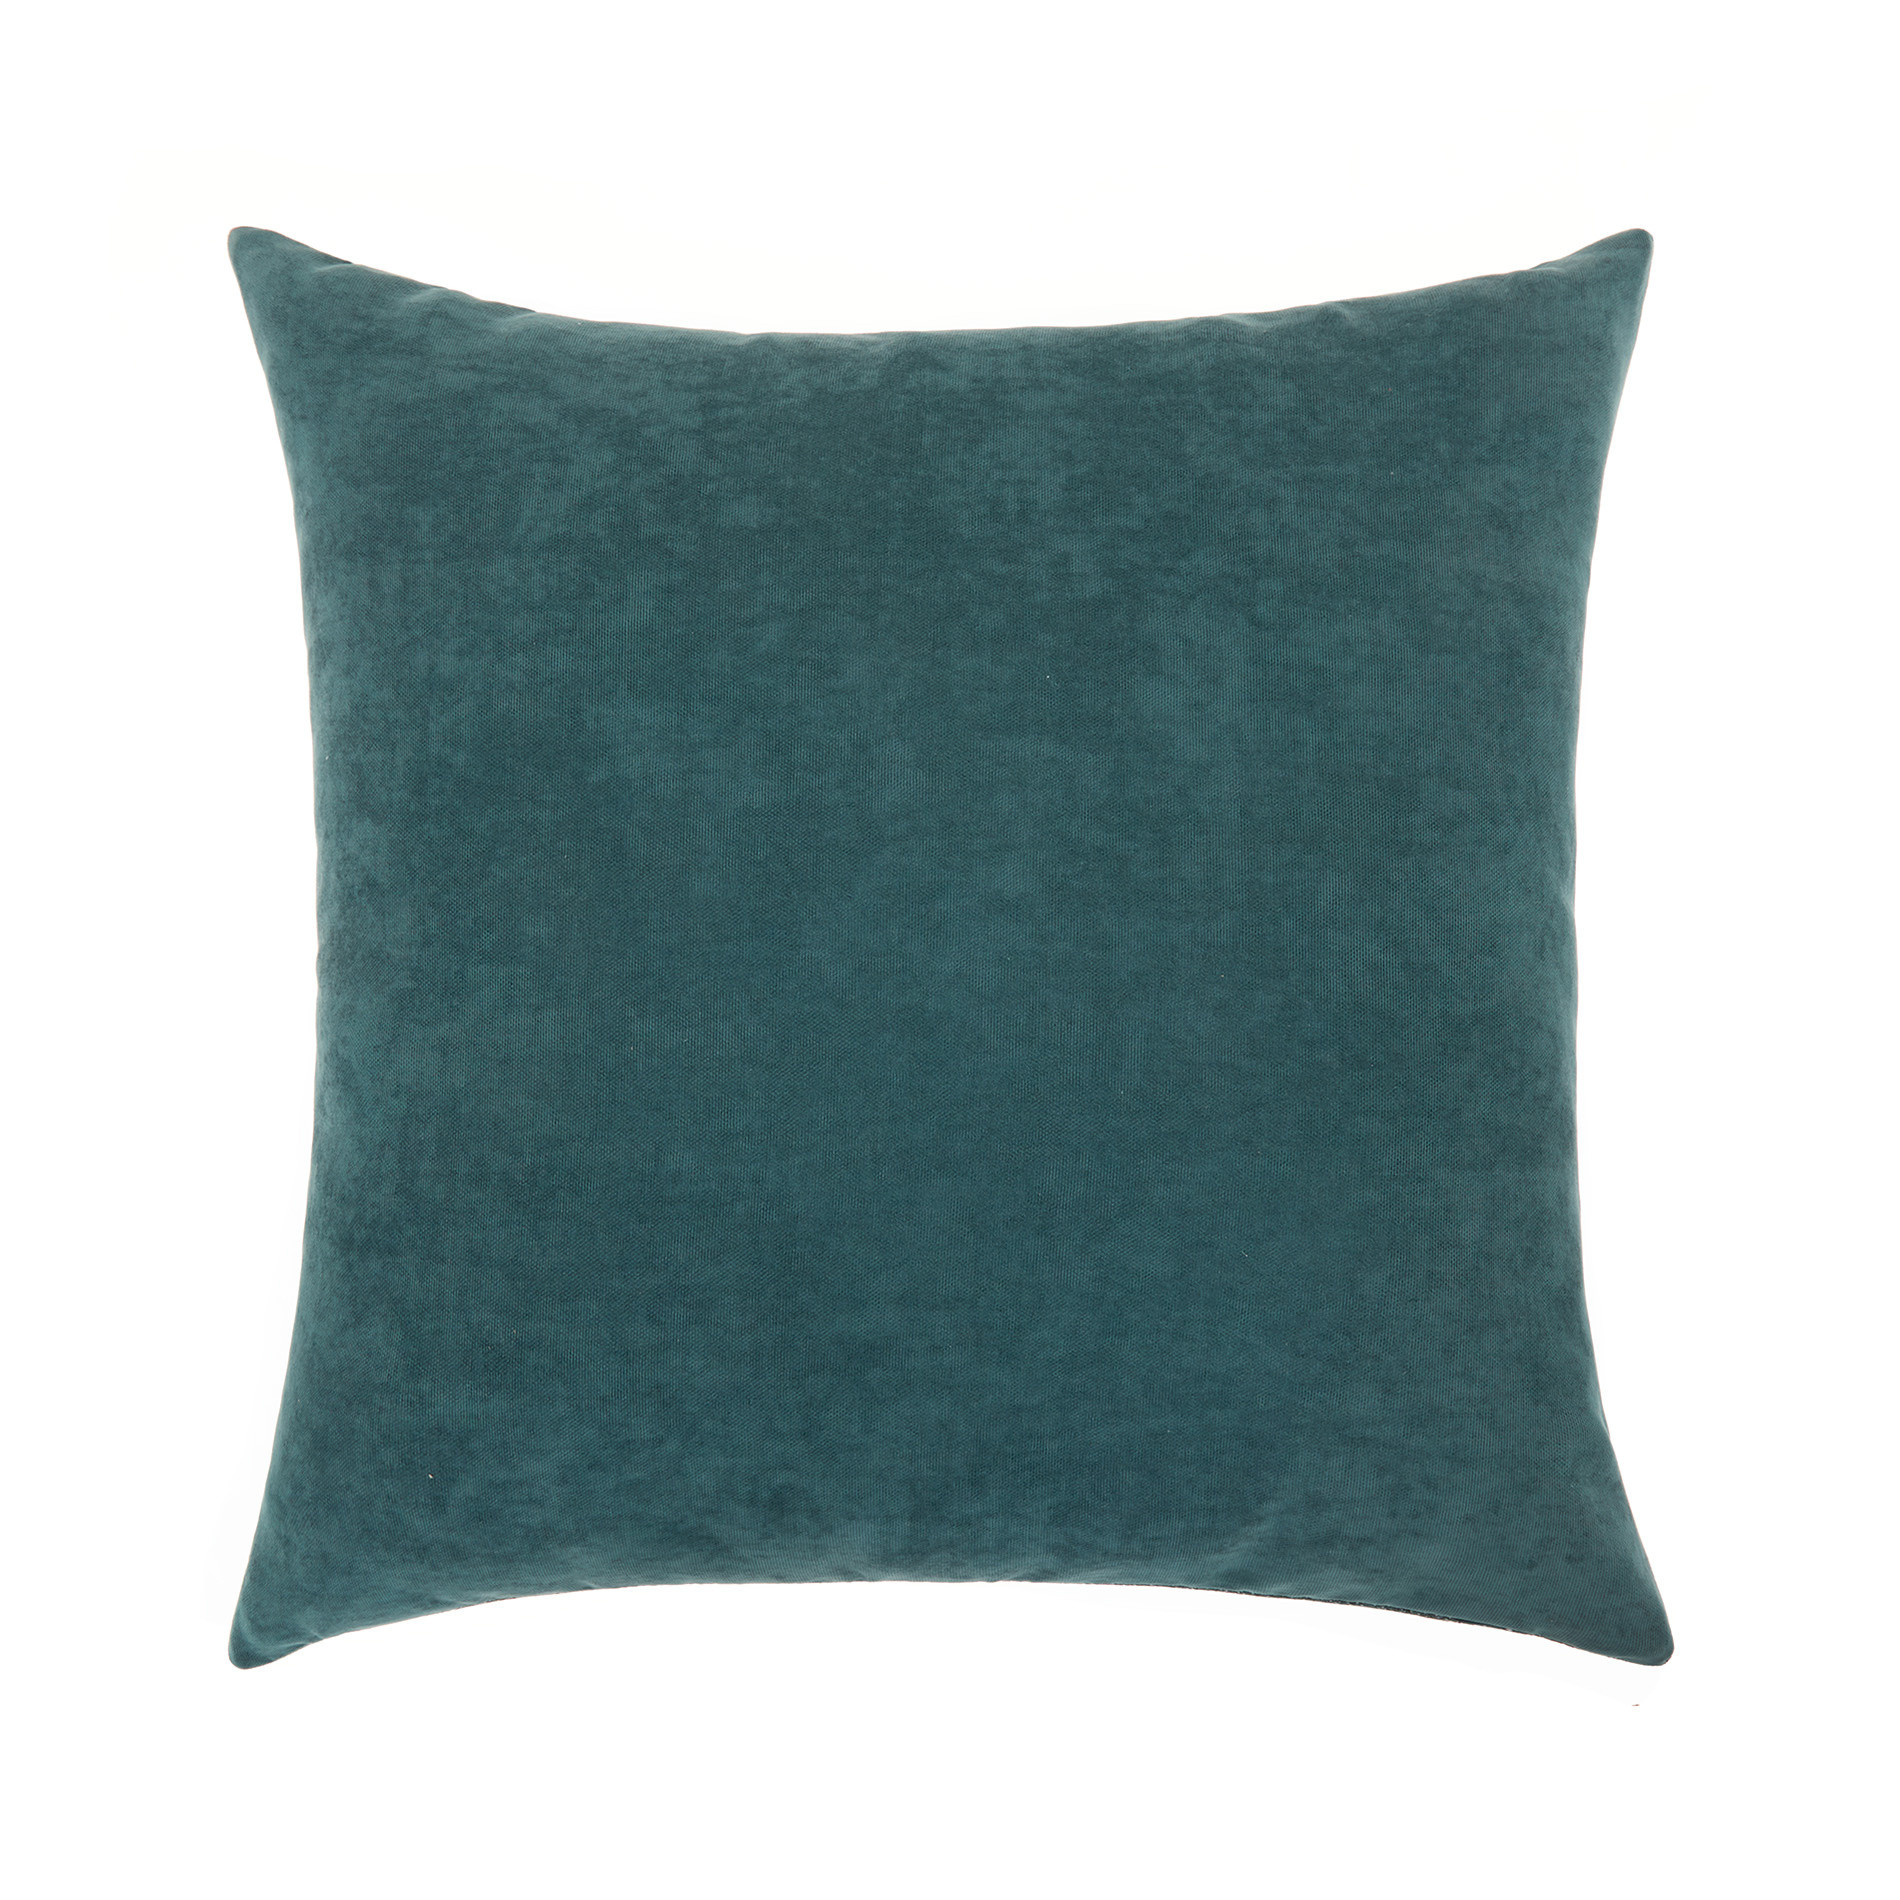 Cuscino sfumature melange 50x50cm, Verde scuro, large image number 1